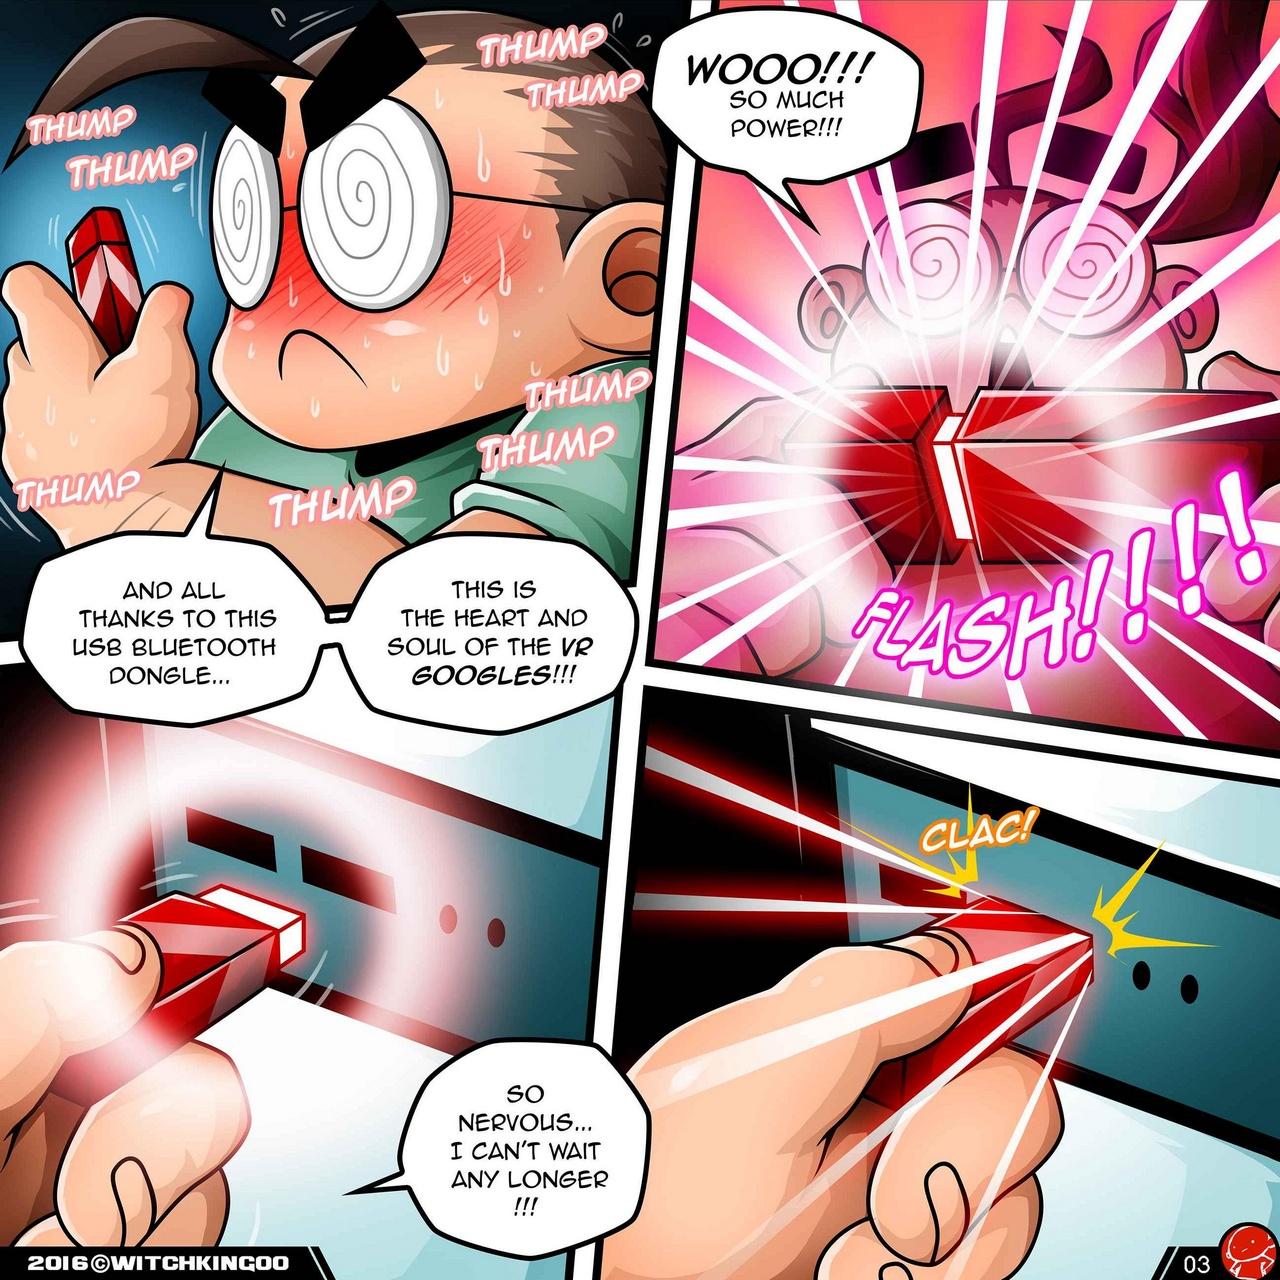 Amazing World Of Gumball Anime Porn Comic vr the comic - overwatch hentai doujinshi